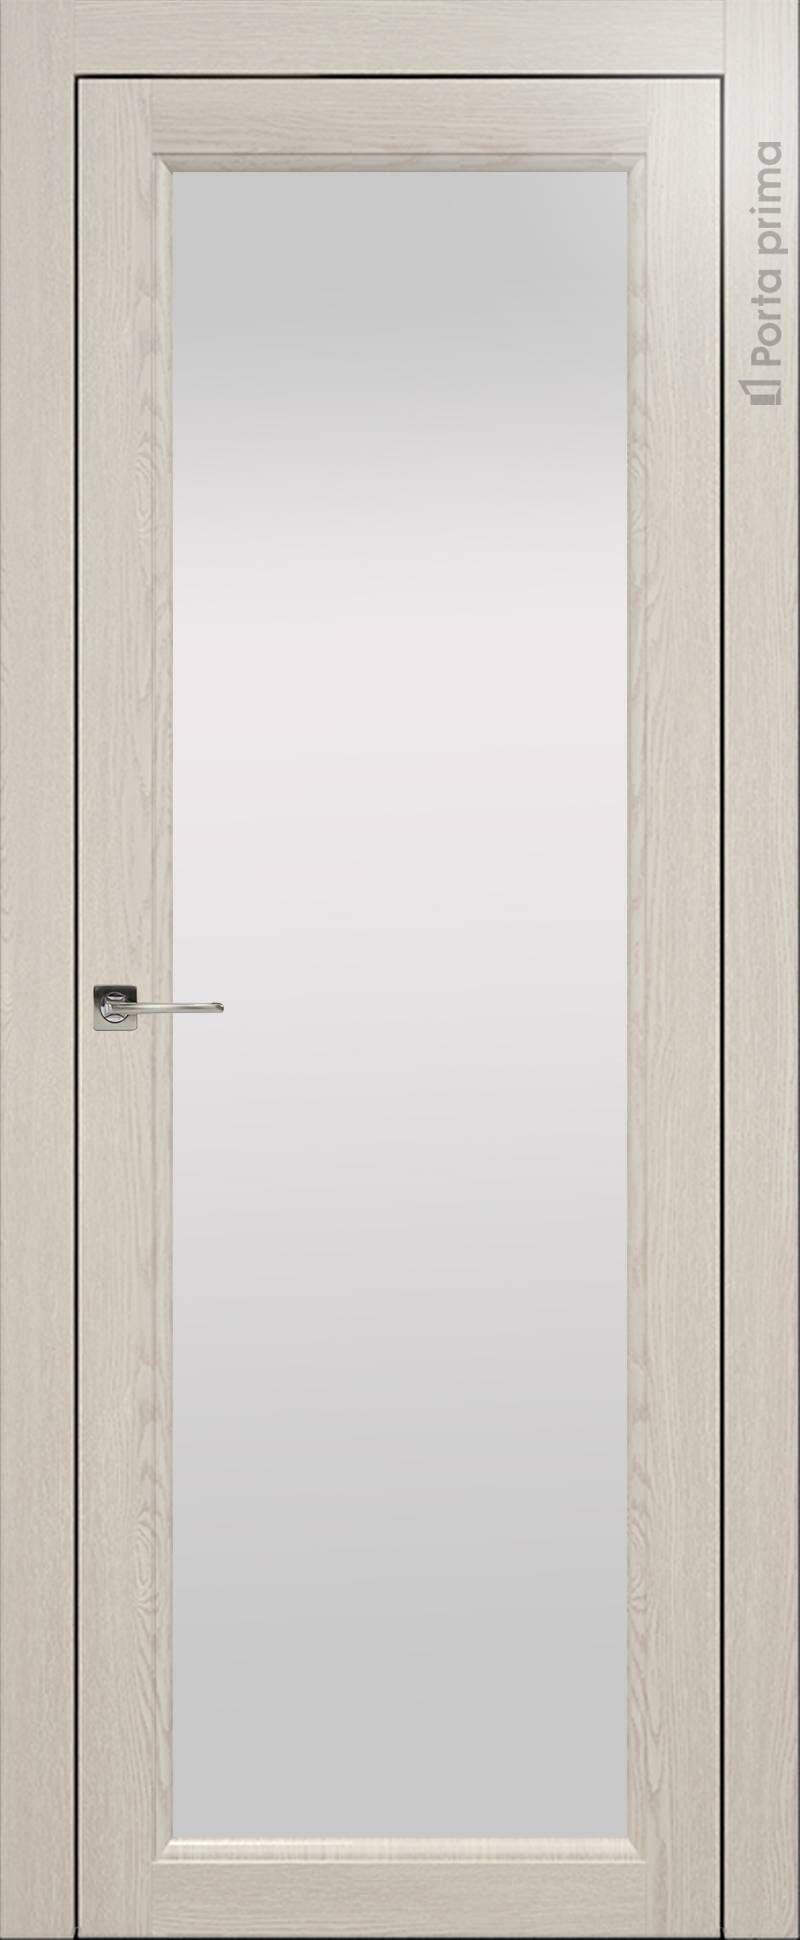 Sorrento-R Б4 цвет - Дуб шампань Со стеклом (ДО)